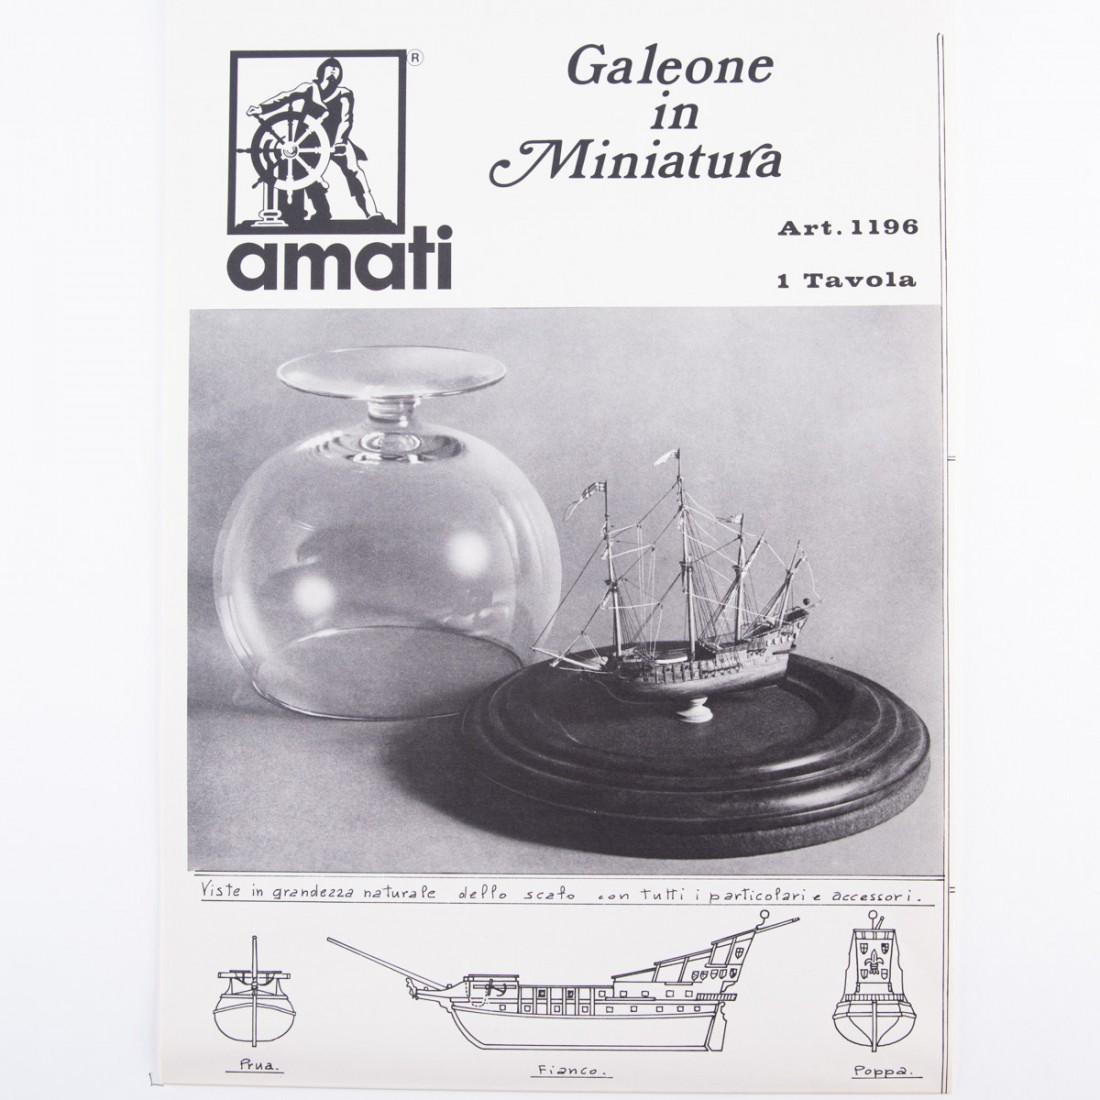 Miniature Galleon